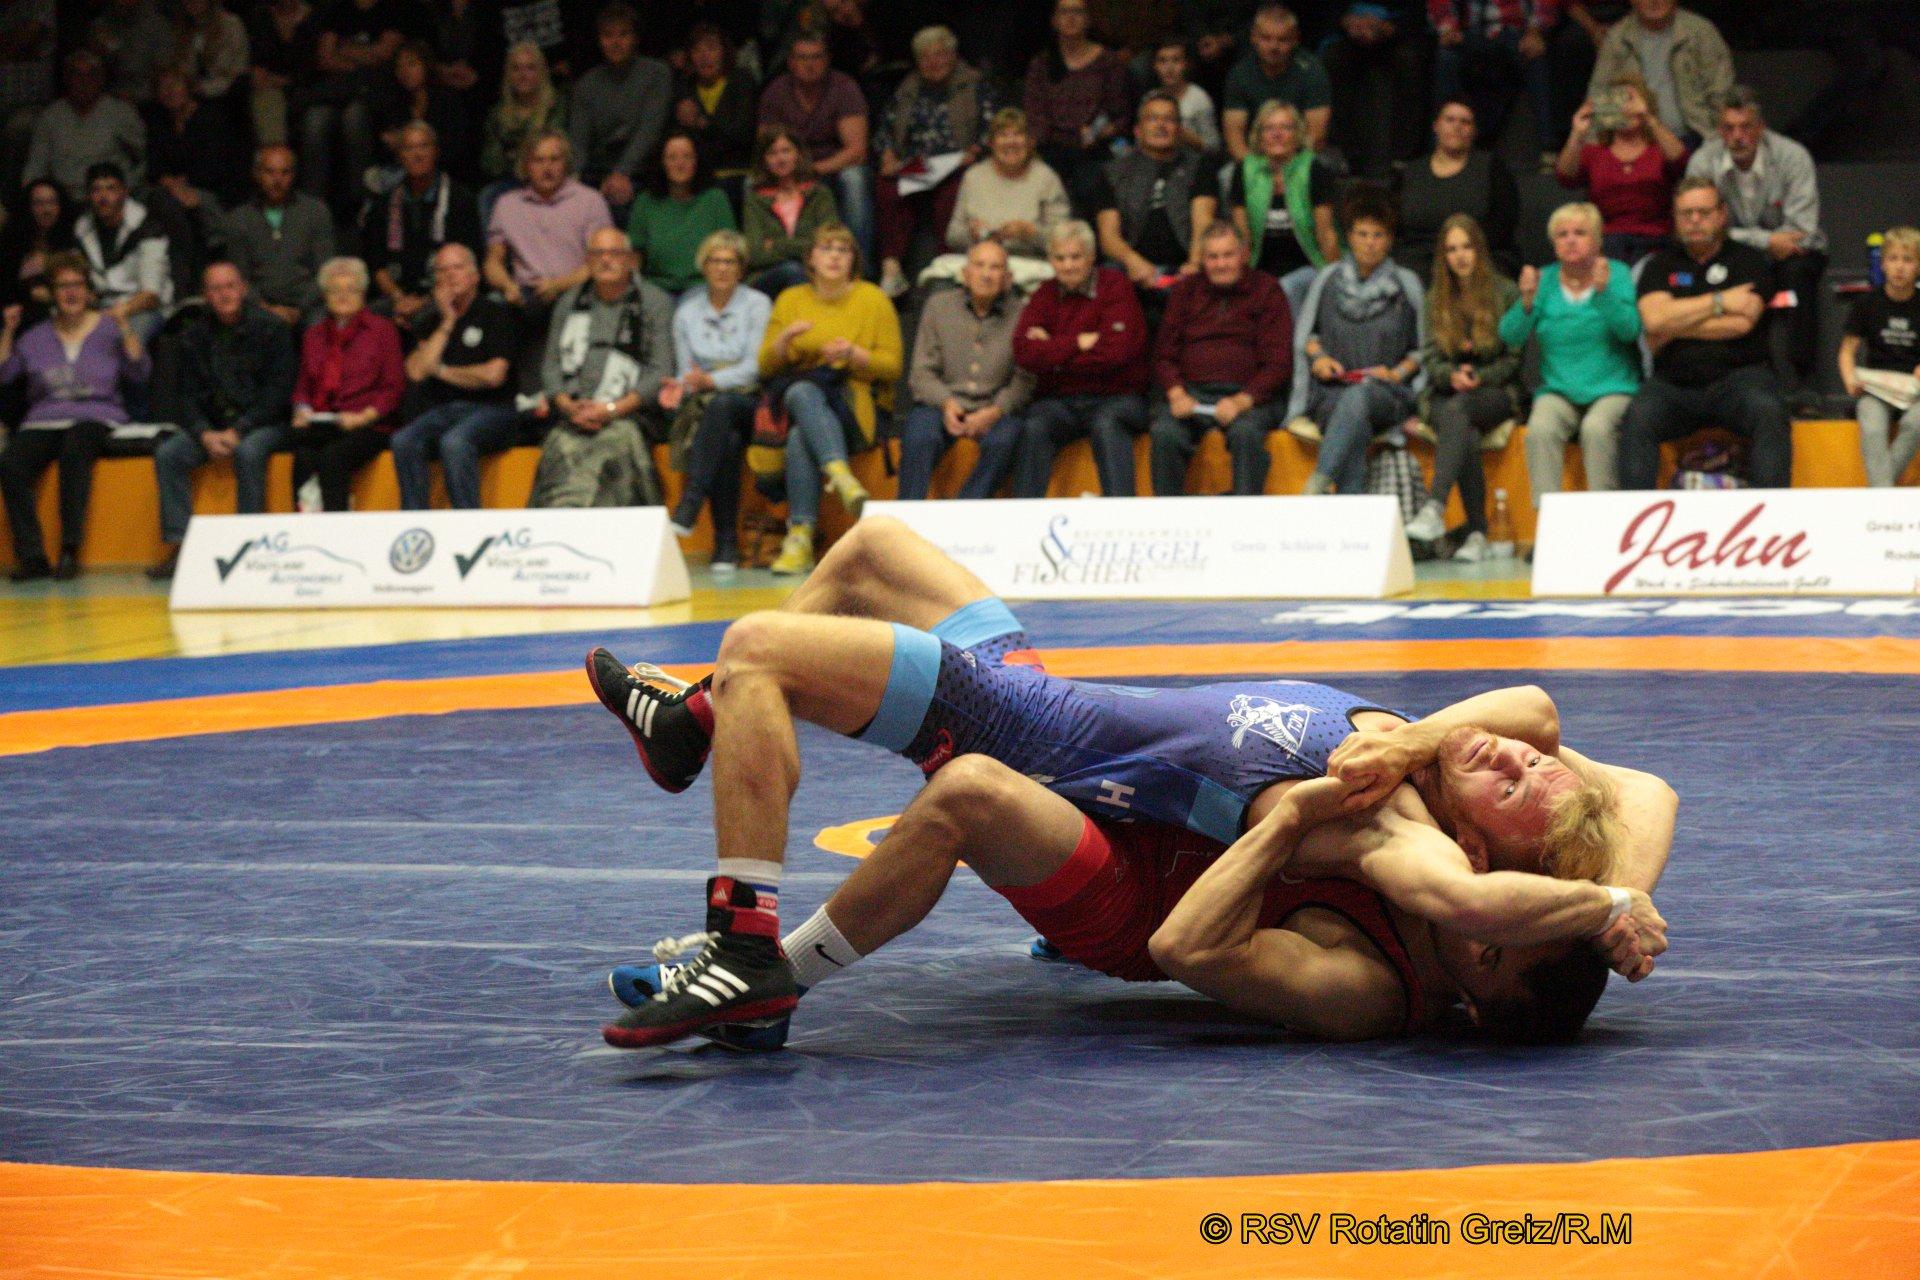 66kg Freistil: Vladimir Gotisan EU (5) (rotes Trikot), RSV Rotation Greiz gegen Bastian Hoffmann (1), AC Lichtenfels 4:0/TÜ/16:1/05:27